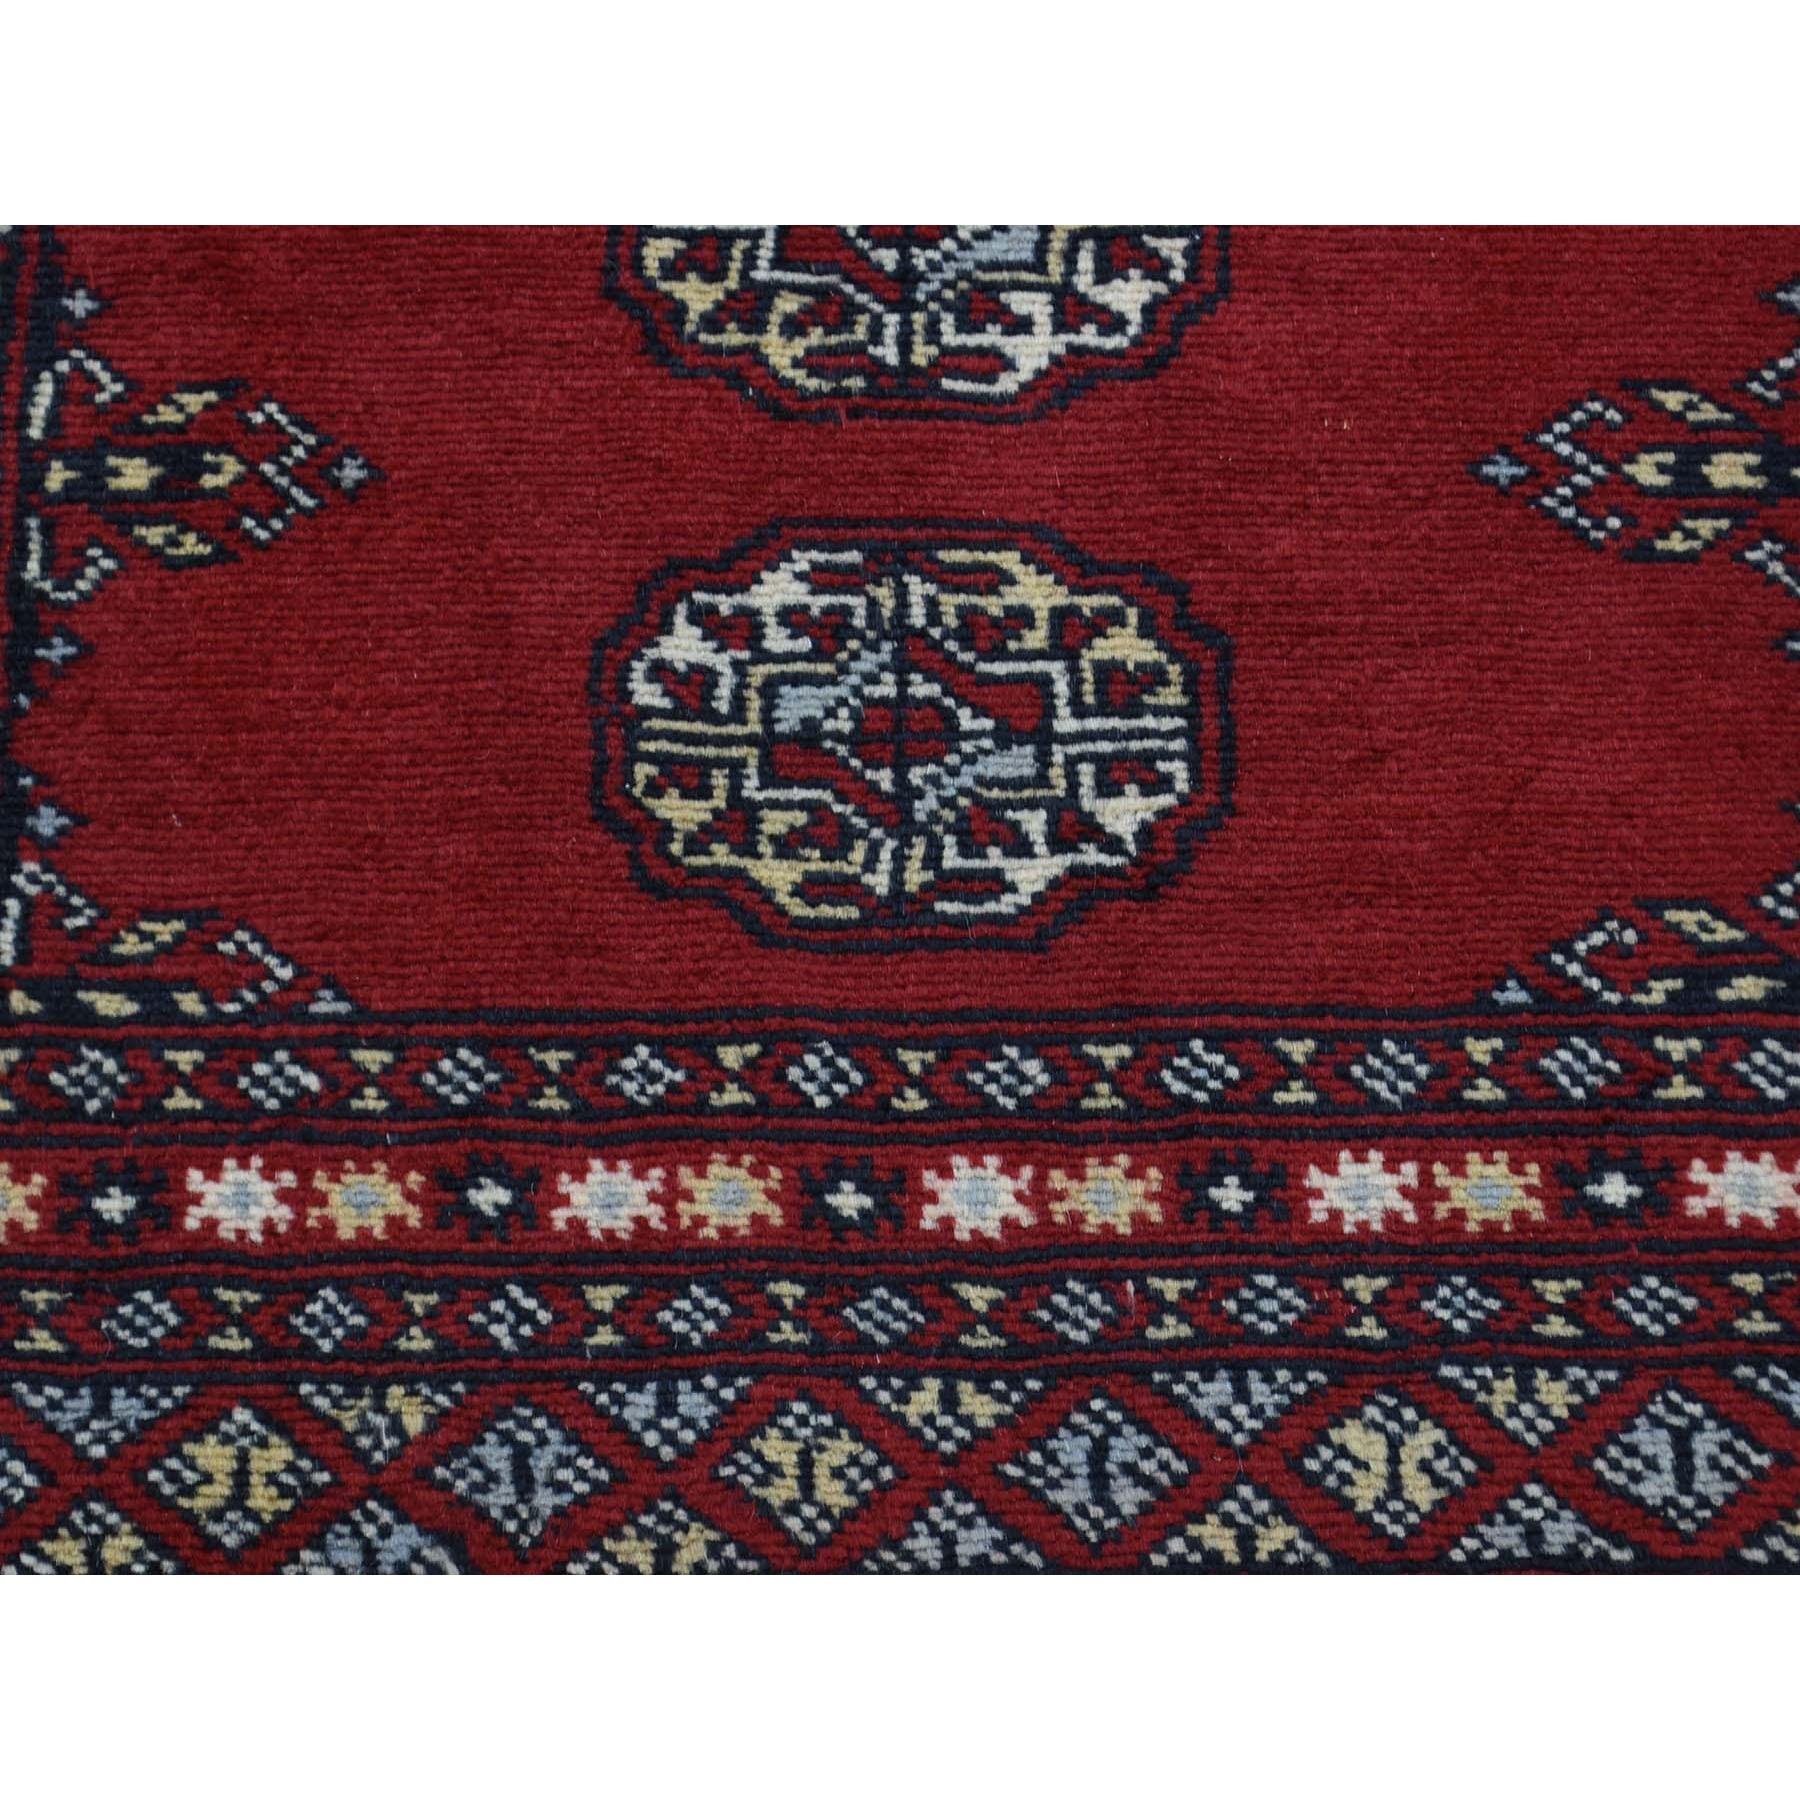 2-1 x3- Hand-Knotted Mori Bokara Elephant Feet Design Oriental Rug